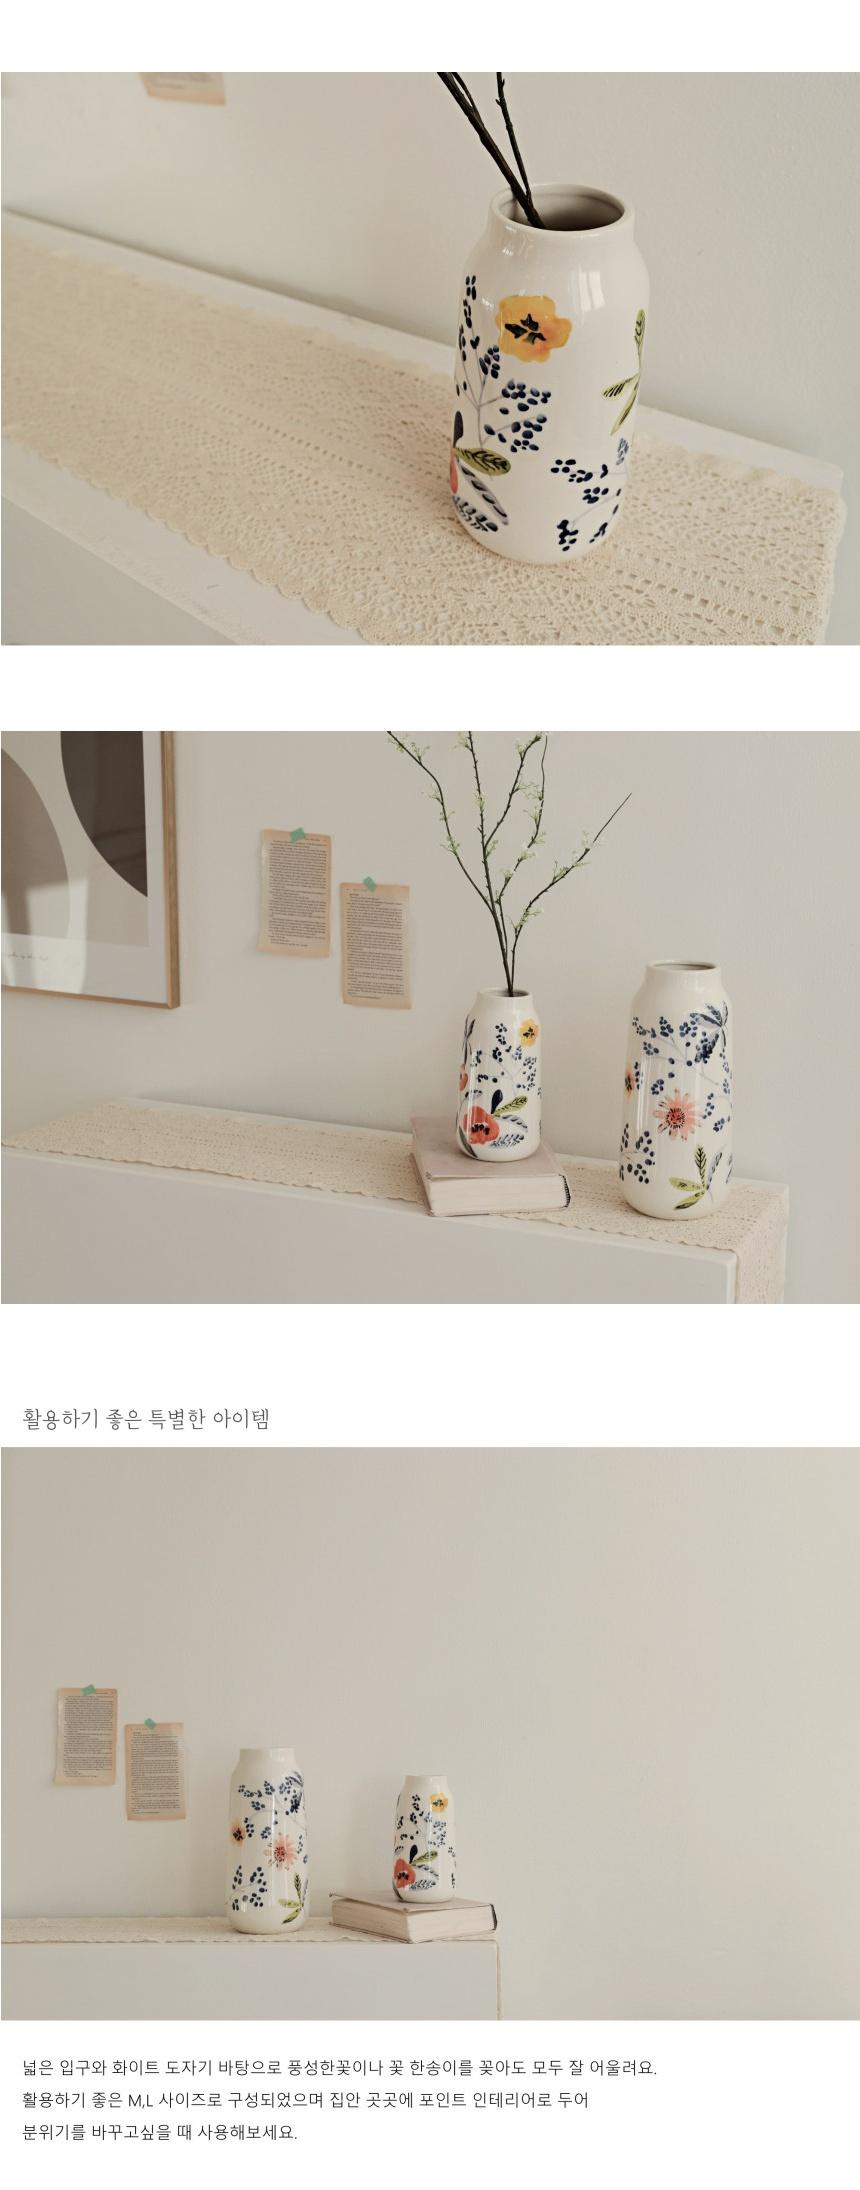 retro_flowerpattern_pottery_vase_03.jpg